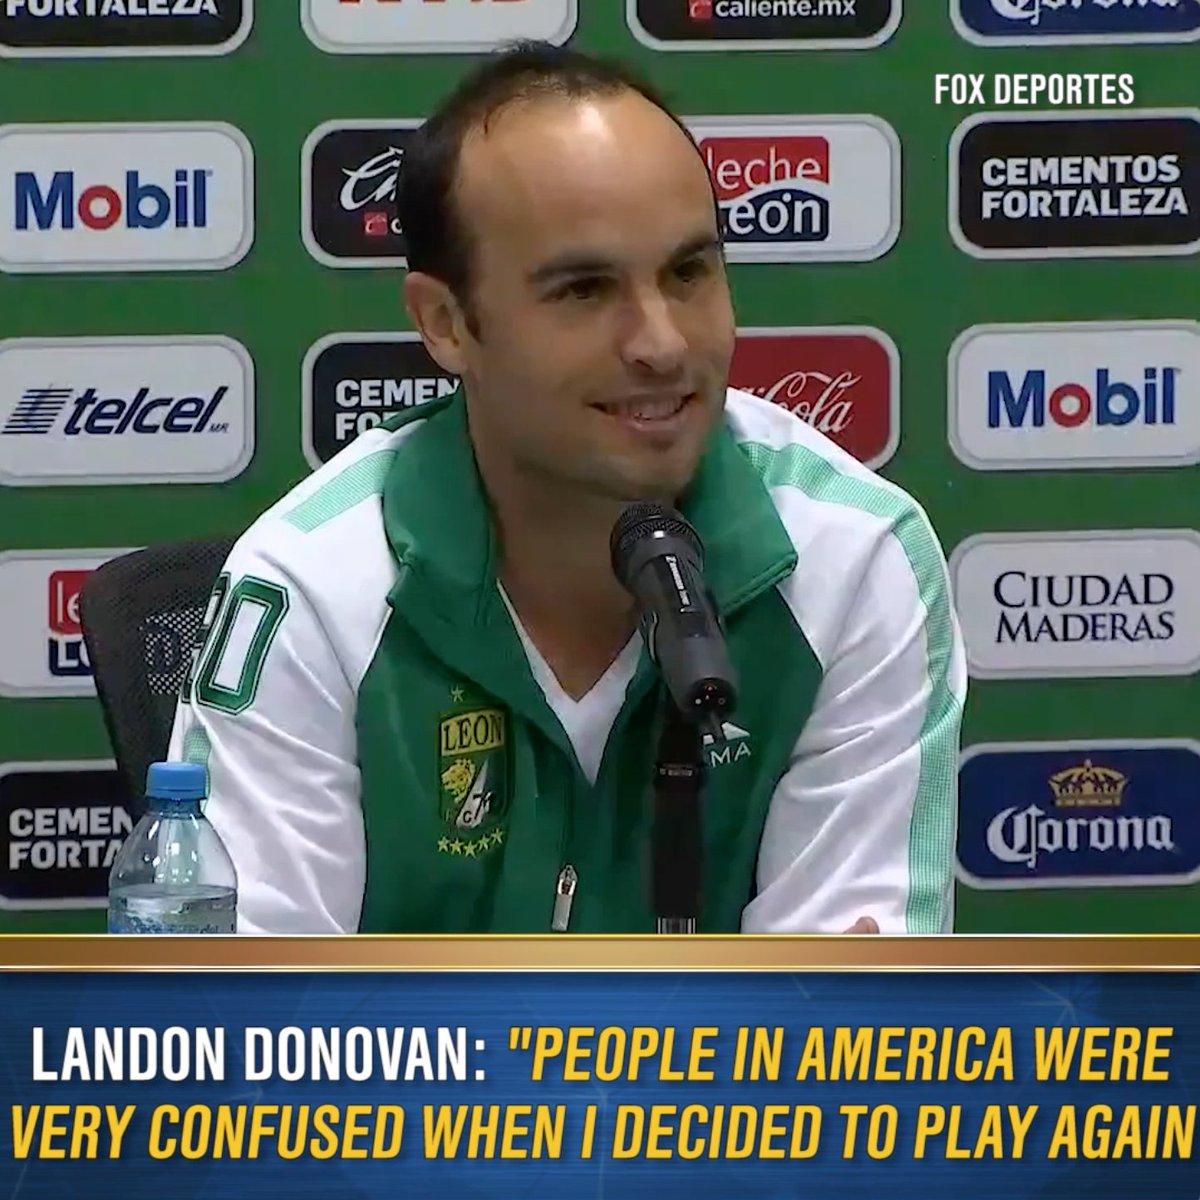 Landon Donovan has said it was landon donovan